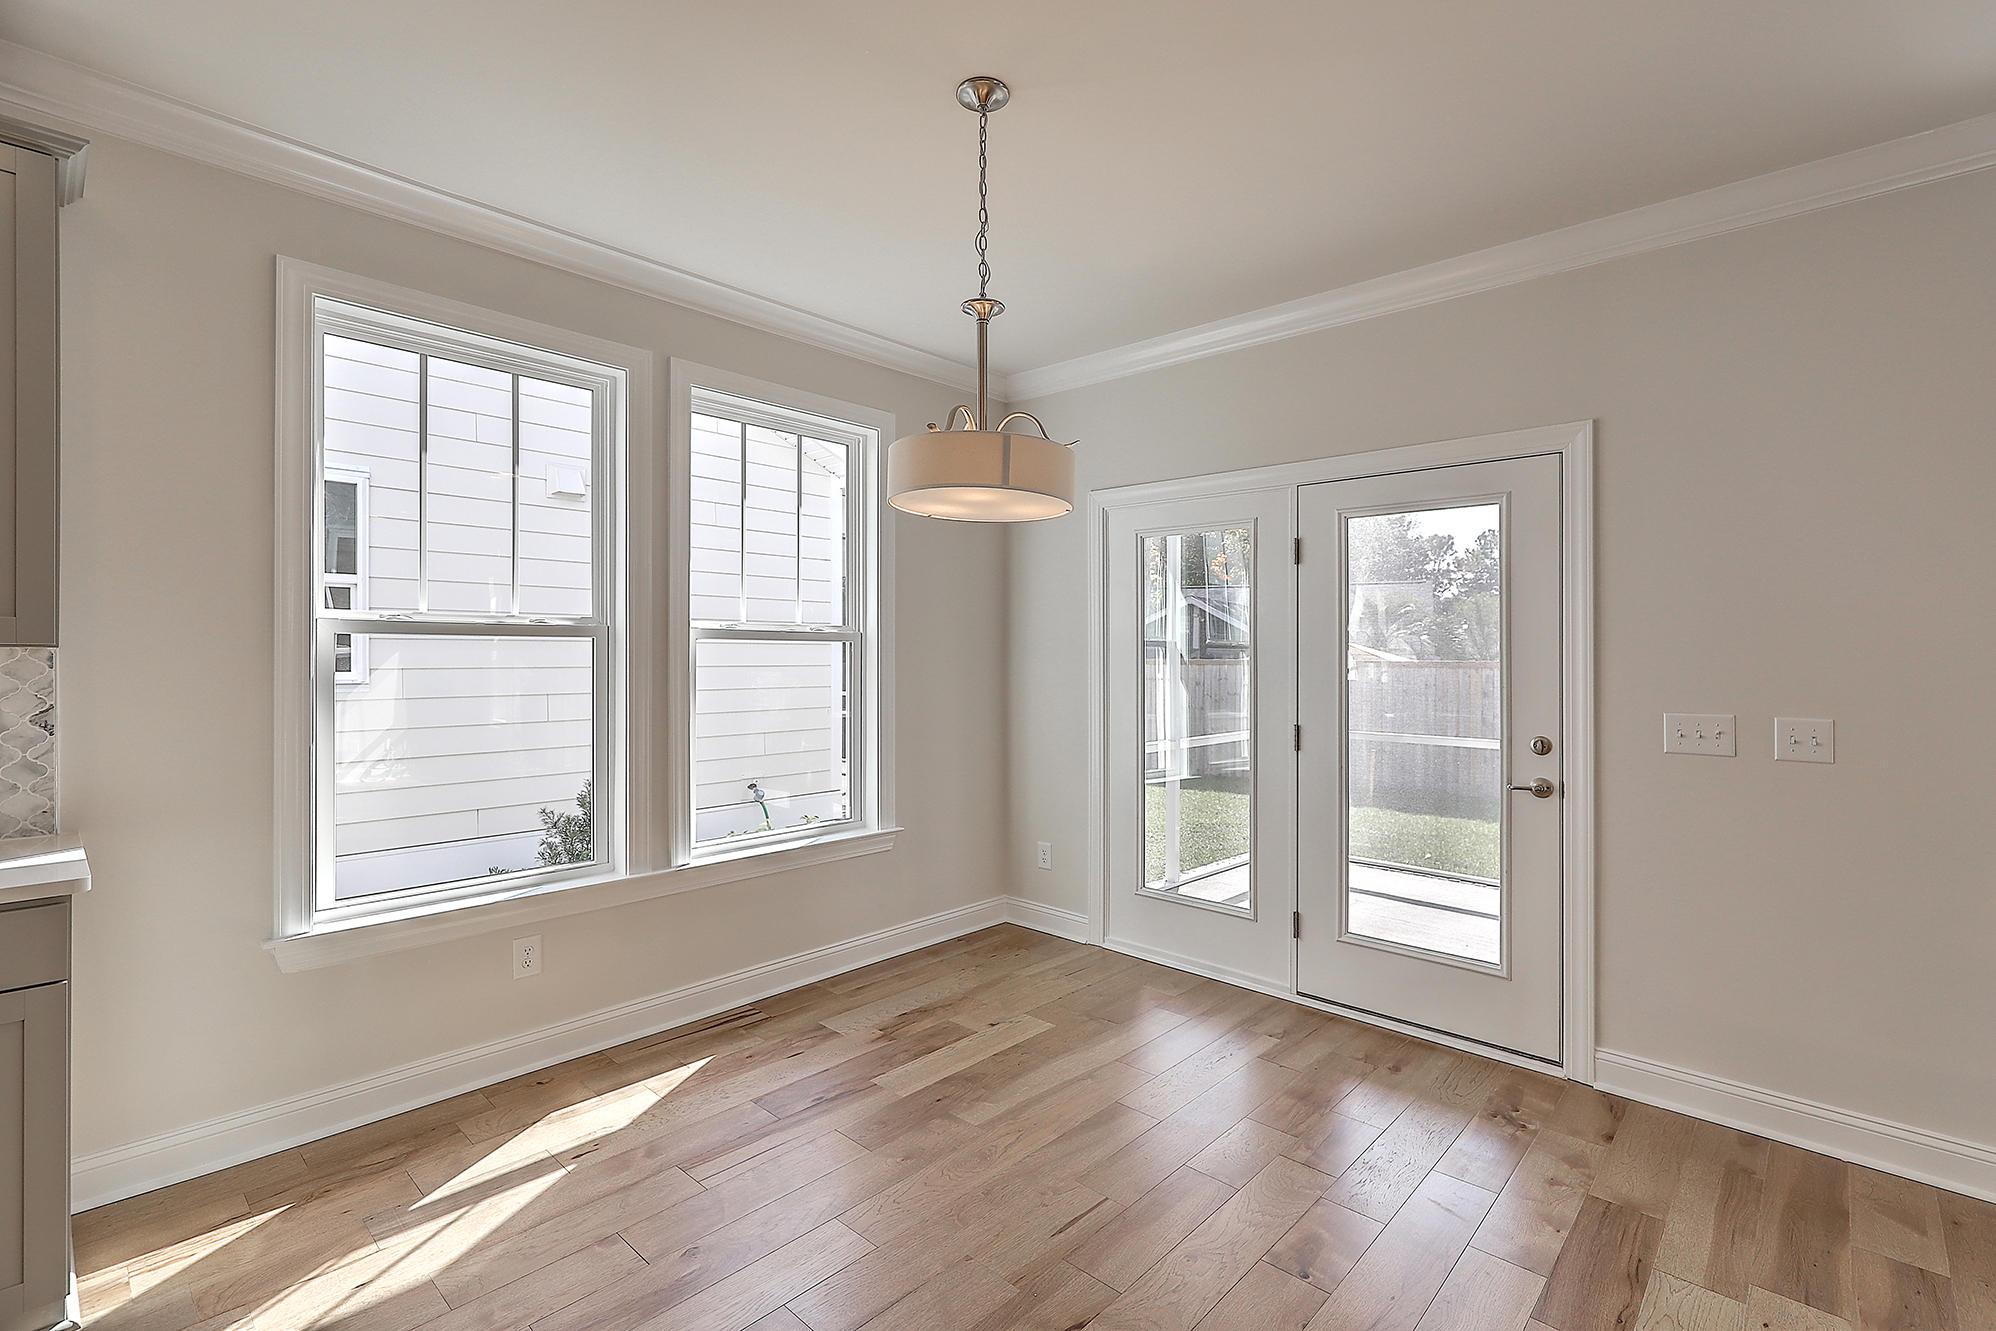 Bentley Park Homes For Sale - 1261 Gannett, Mount Pleasant, SC - 11